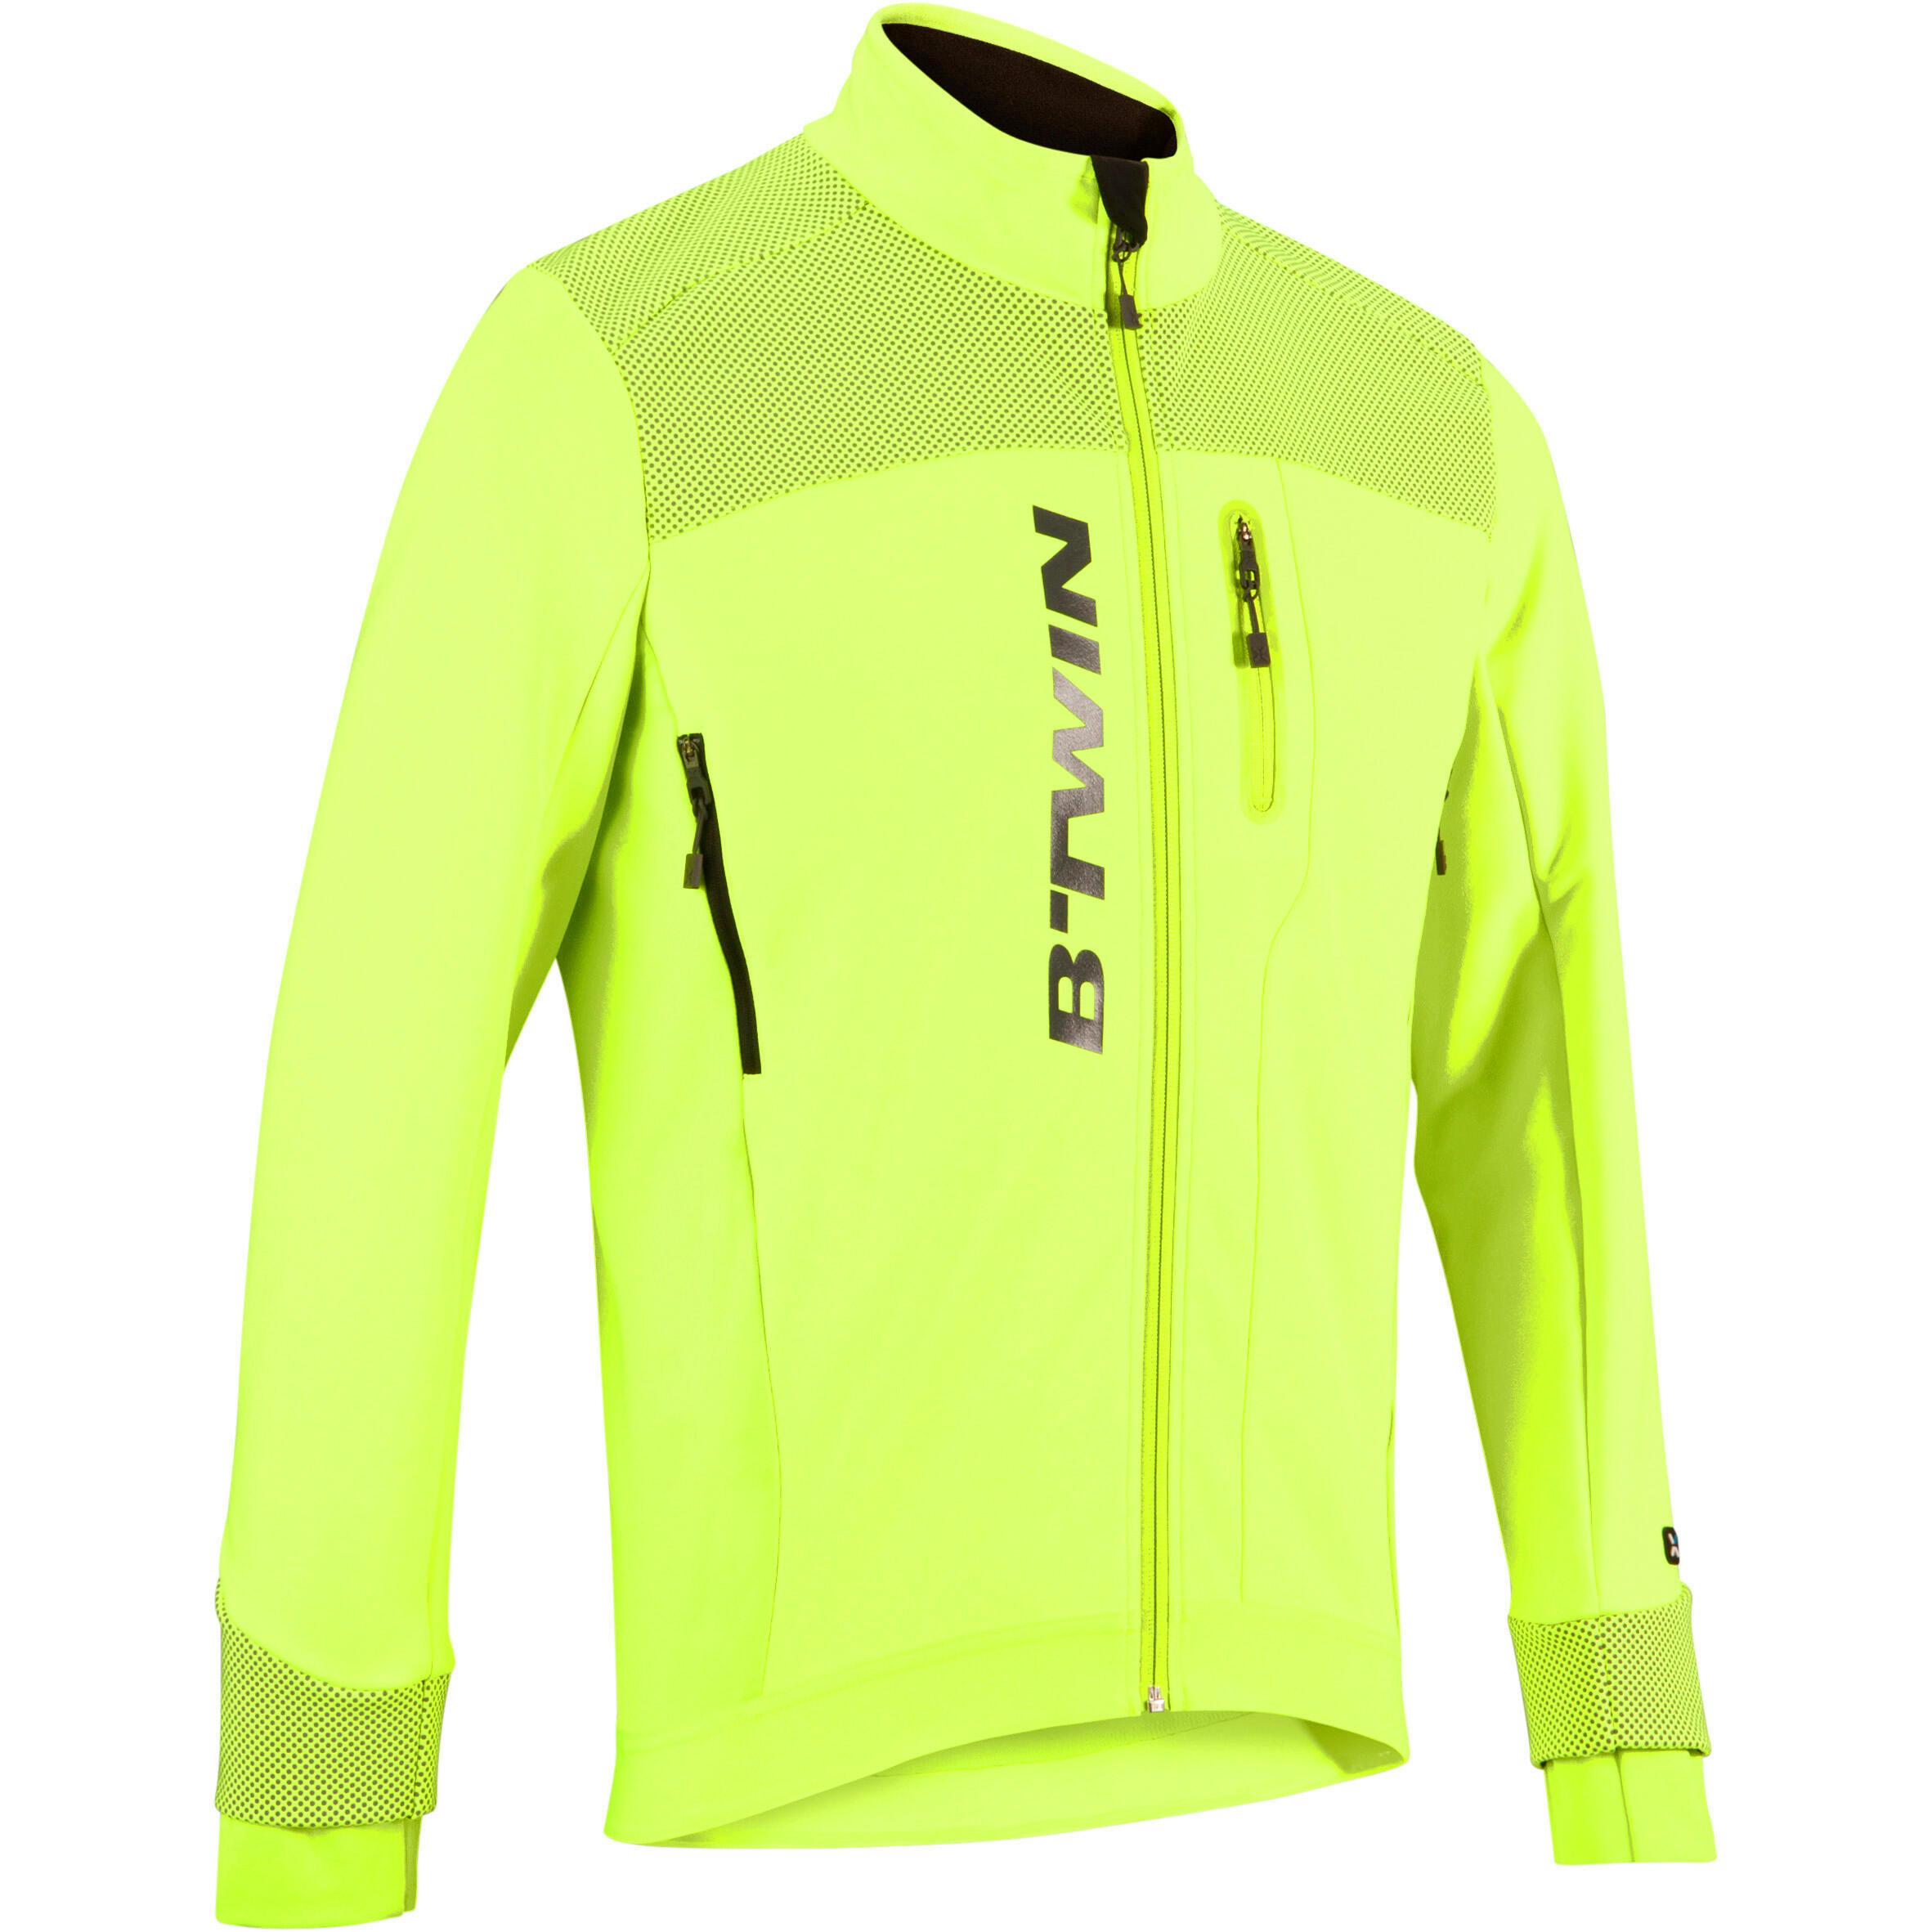 Fahrradjacke 520 Radsport Herren kaltes Wetter neongelb | Sportbekleidung > Sportjacken > Fahrradjacken | B'twin